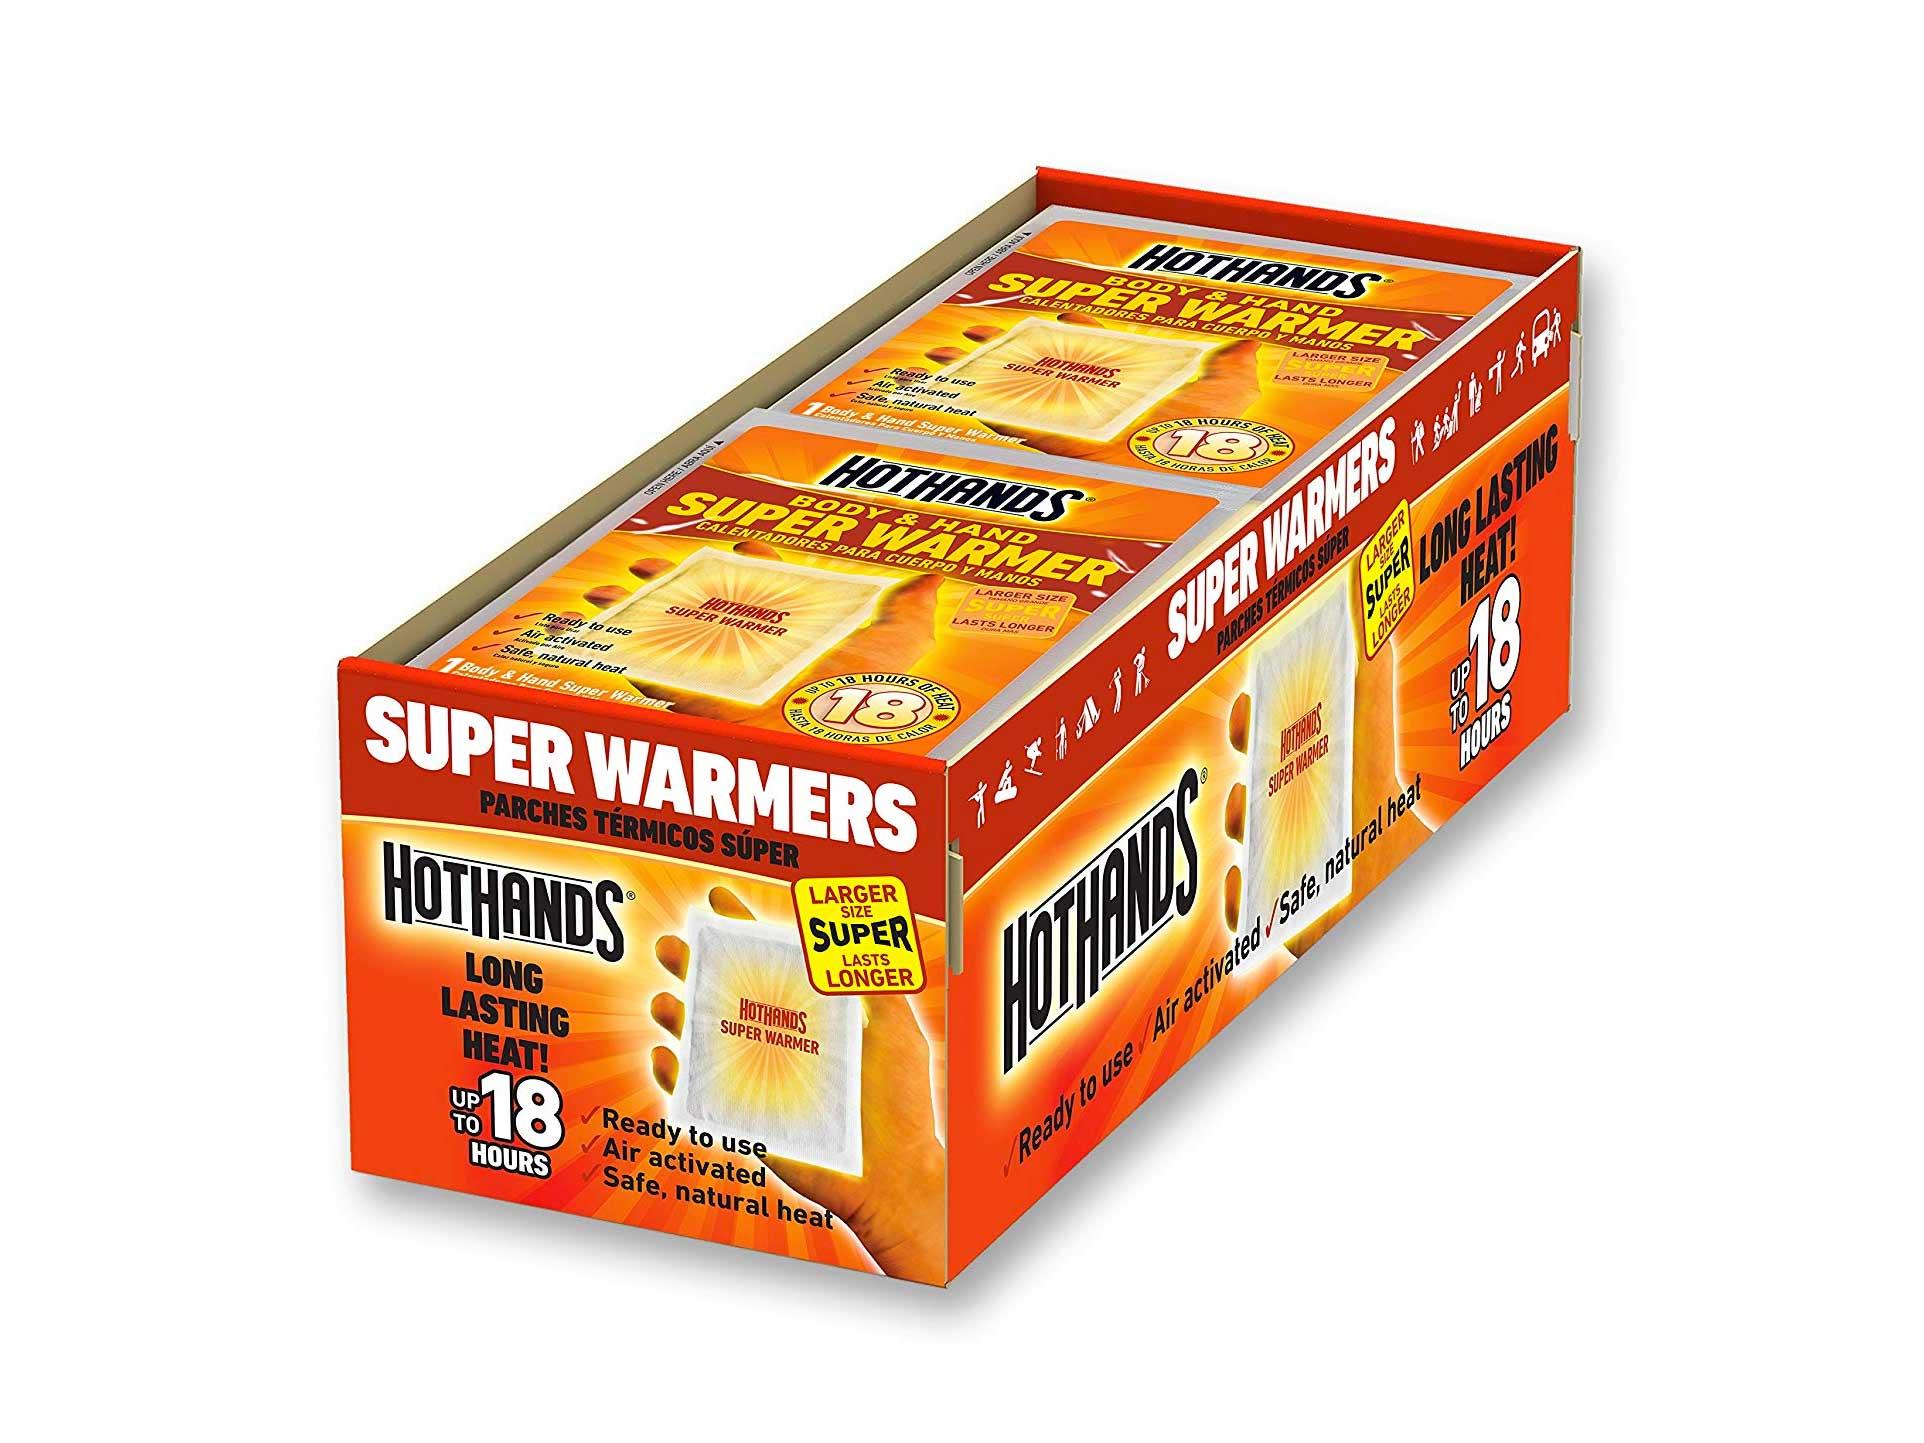 HeatMax HotHands Super Warmers